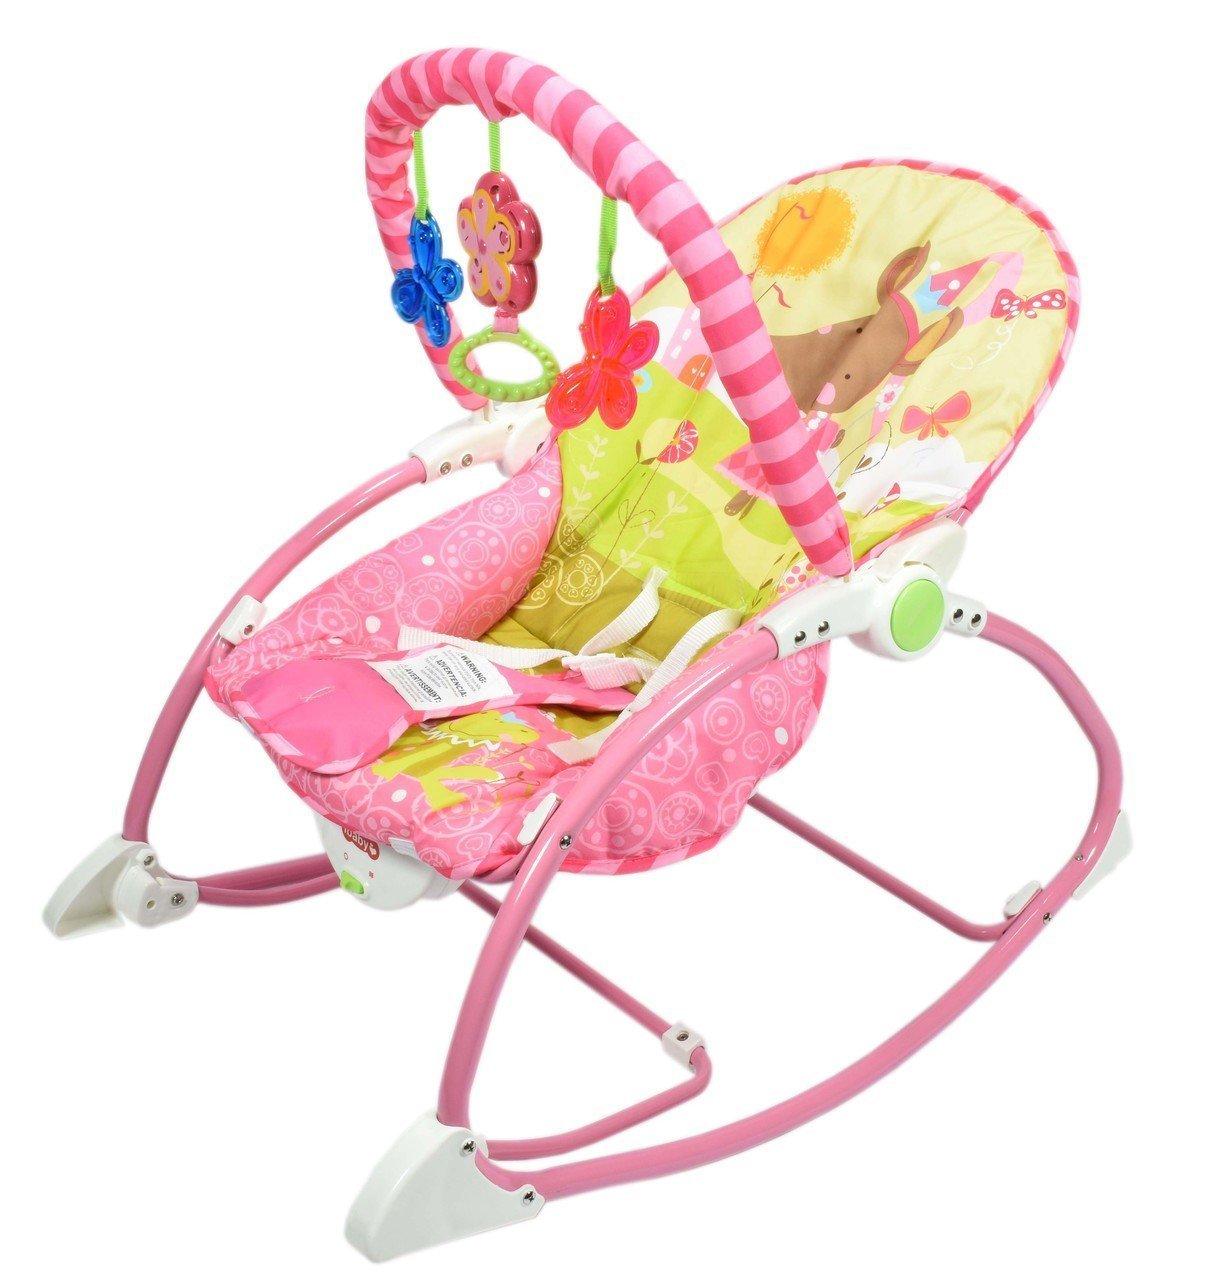 Zest 4 Toyz Non Toxic Fabric Musical Newborn to Toddler Rocker Play Set (Multicolour)